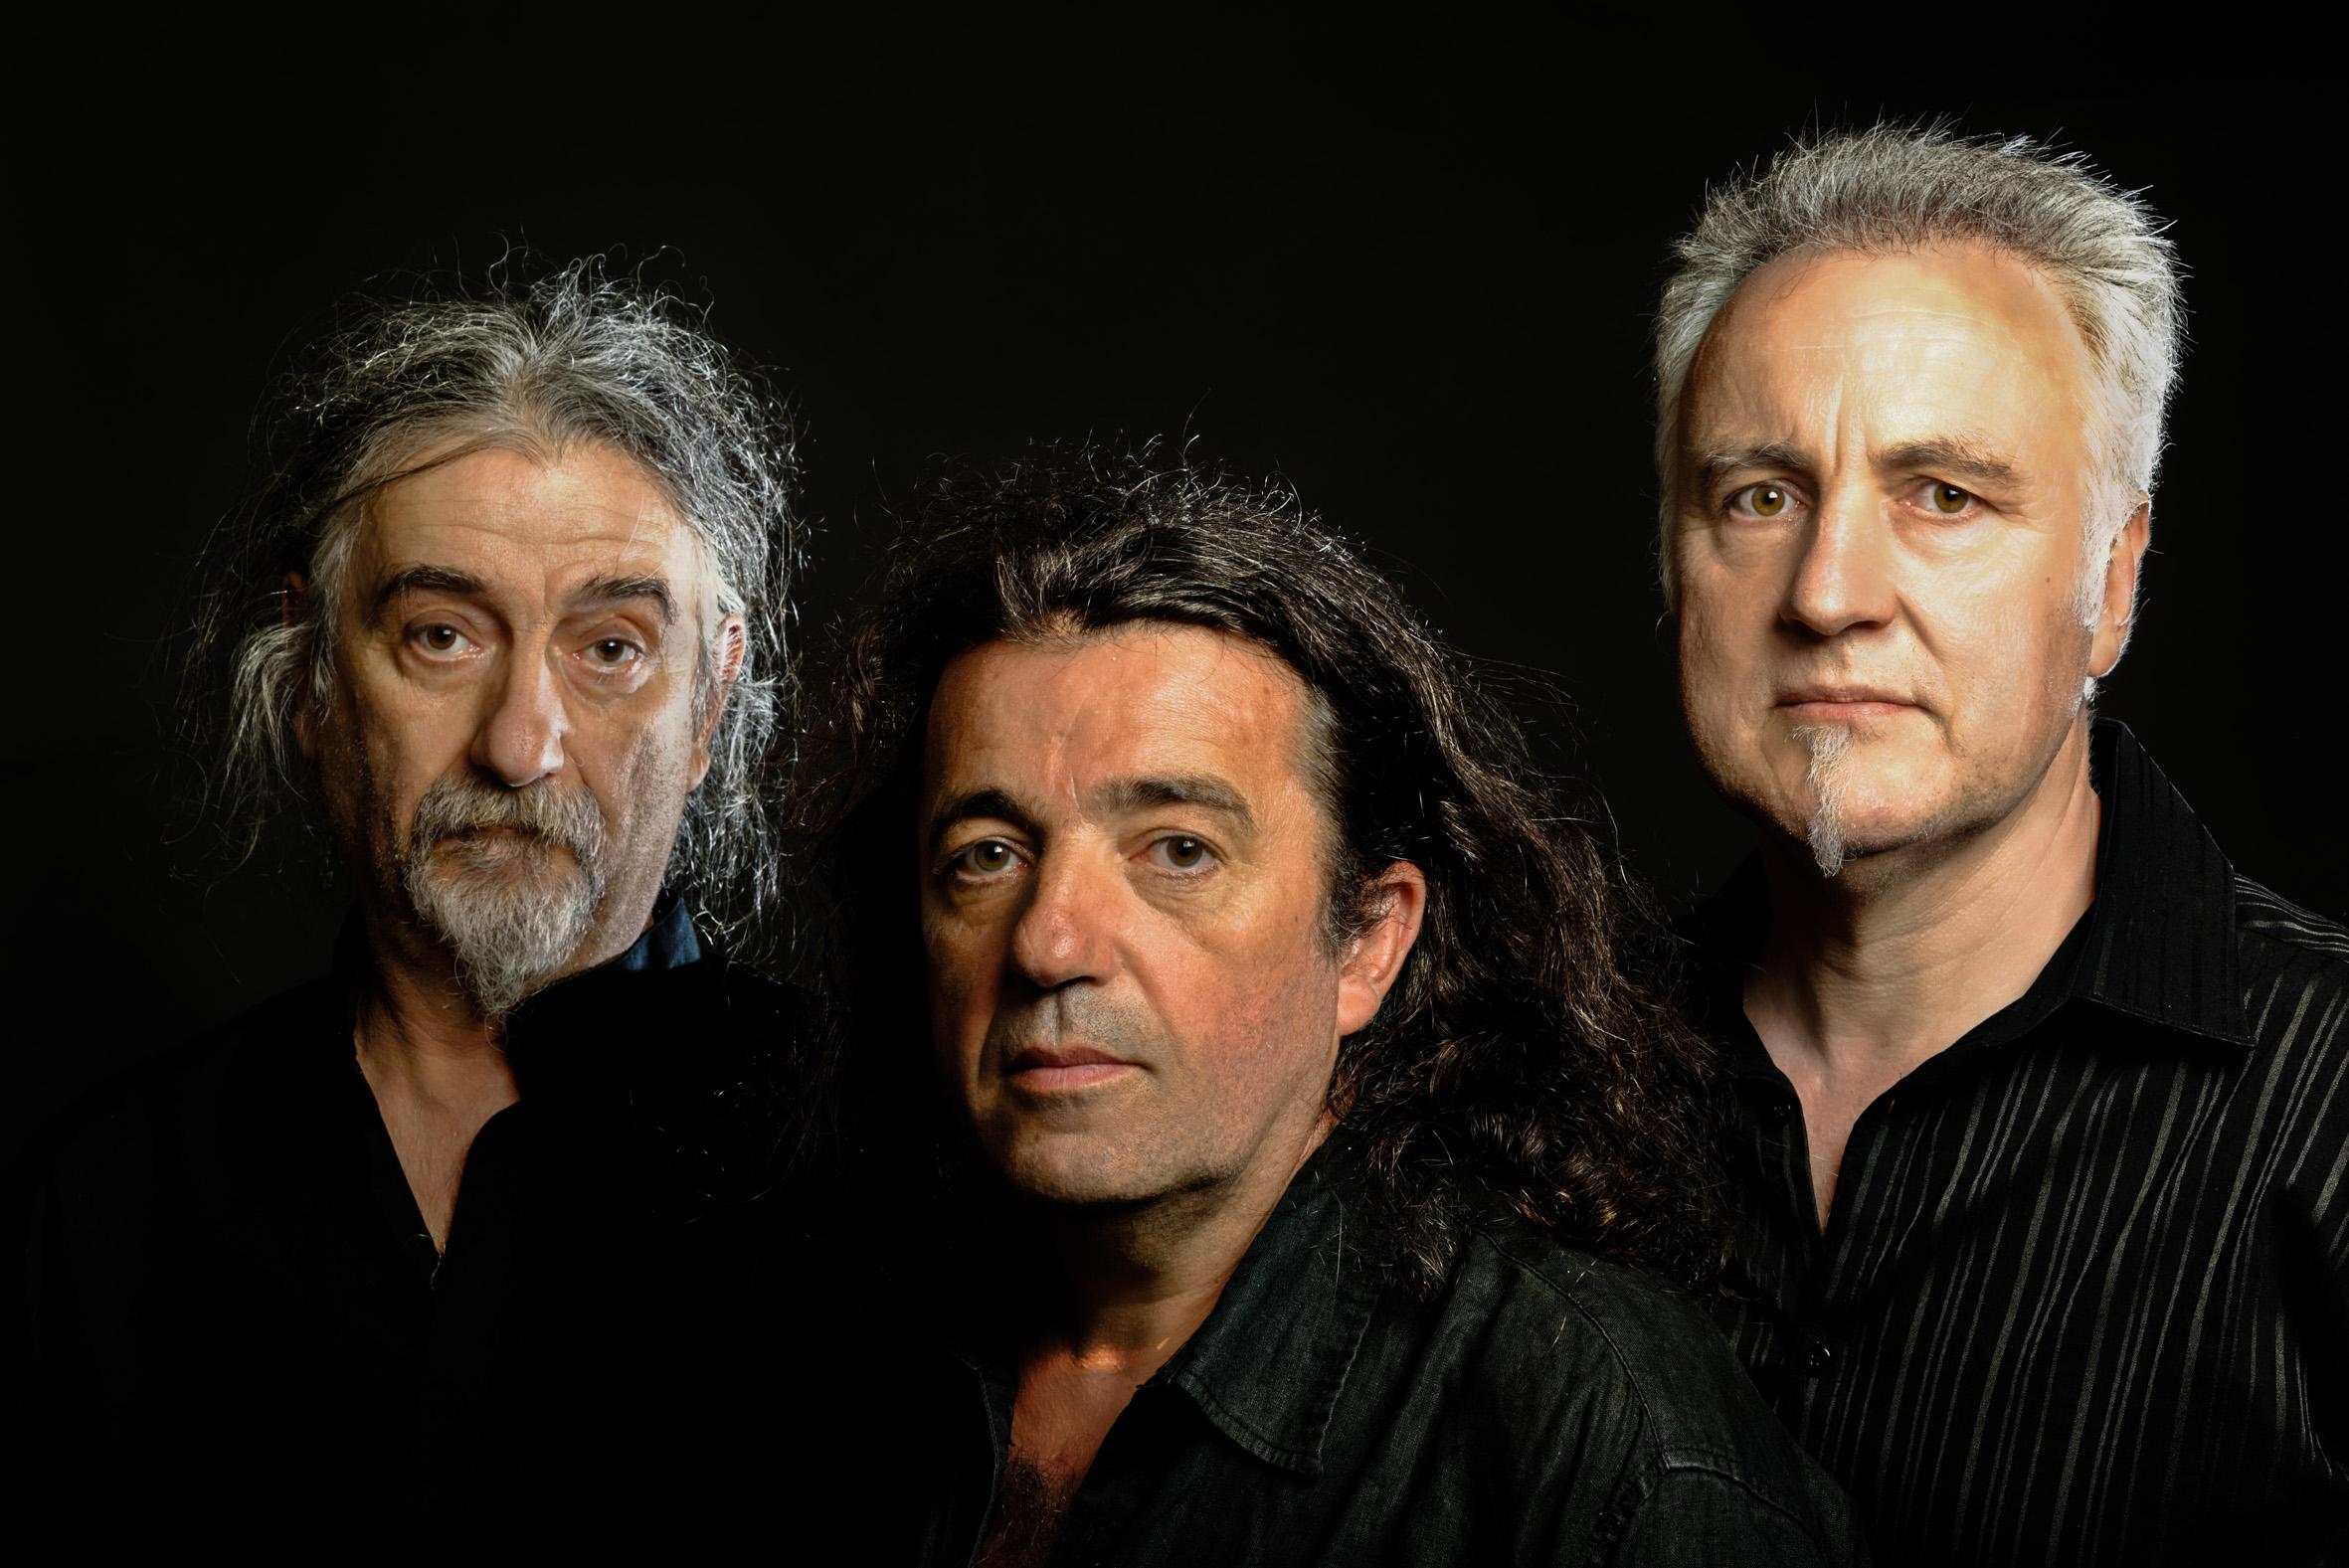 Trio Erms